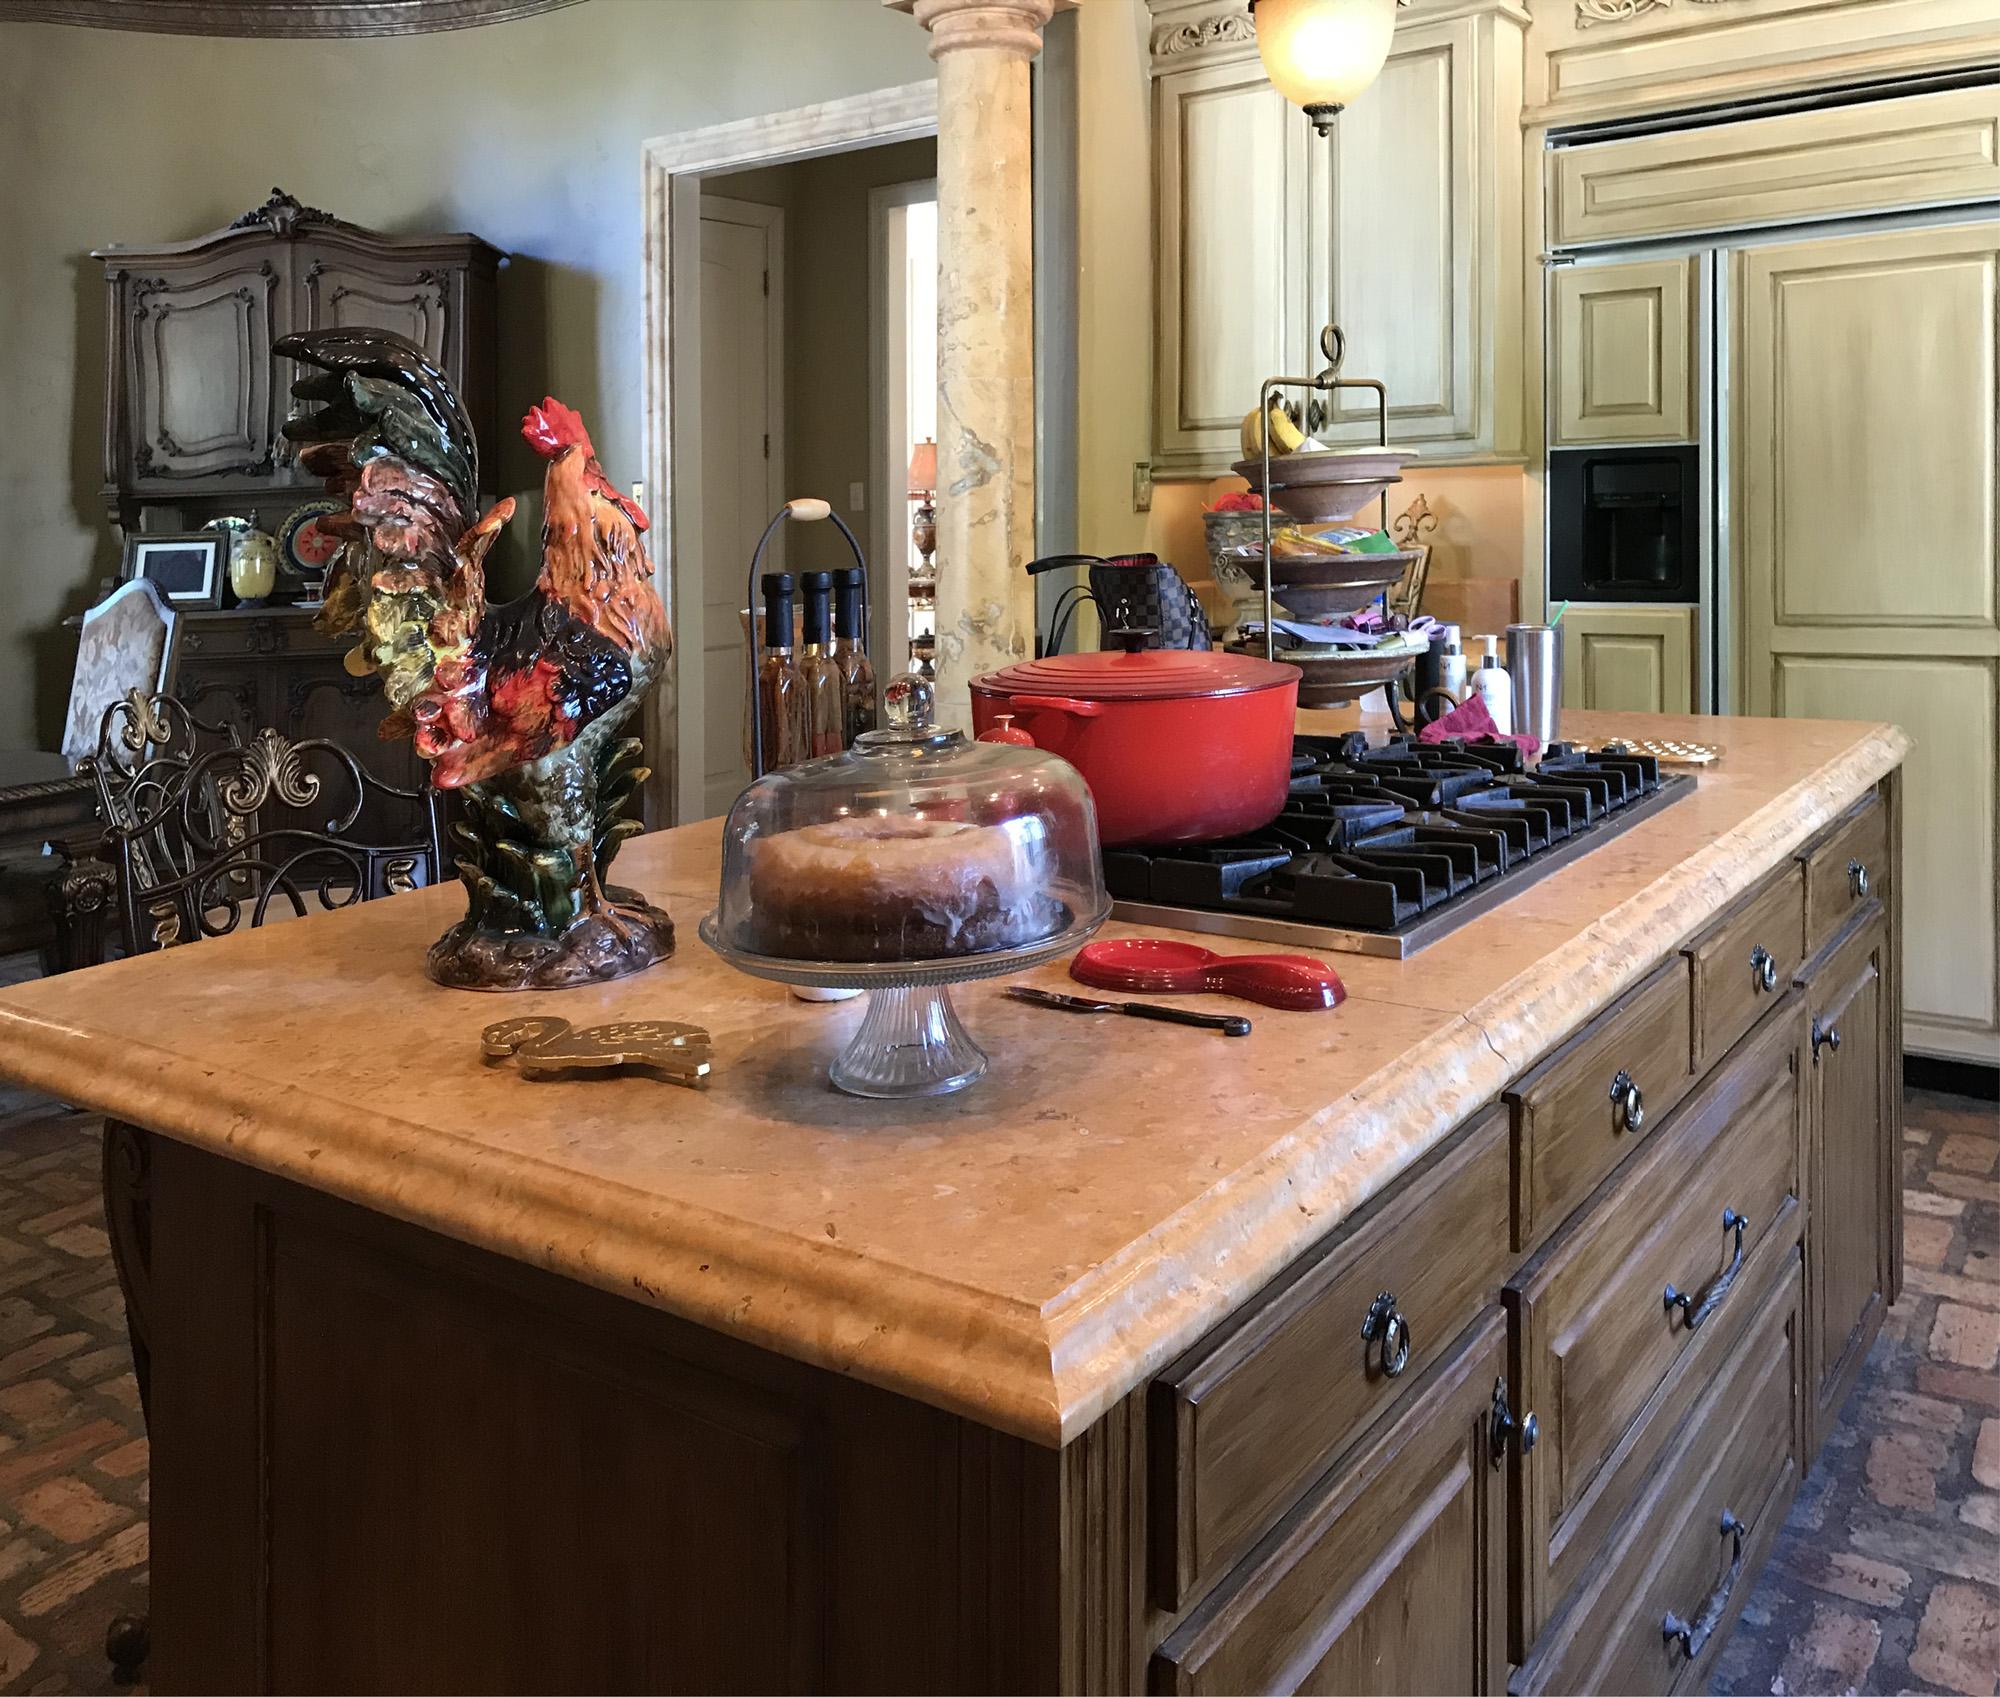 kitchenIsland_Morris_2000x1697_IMG_2381.jpg